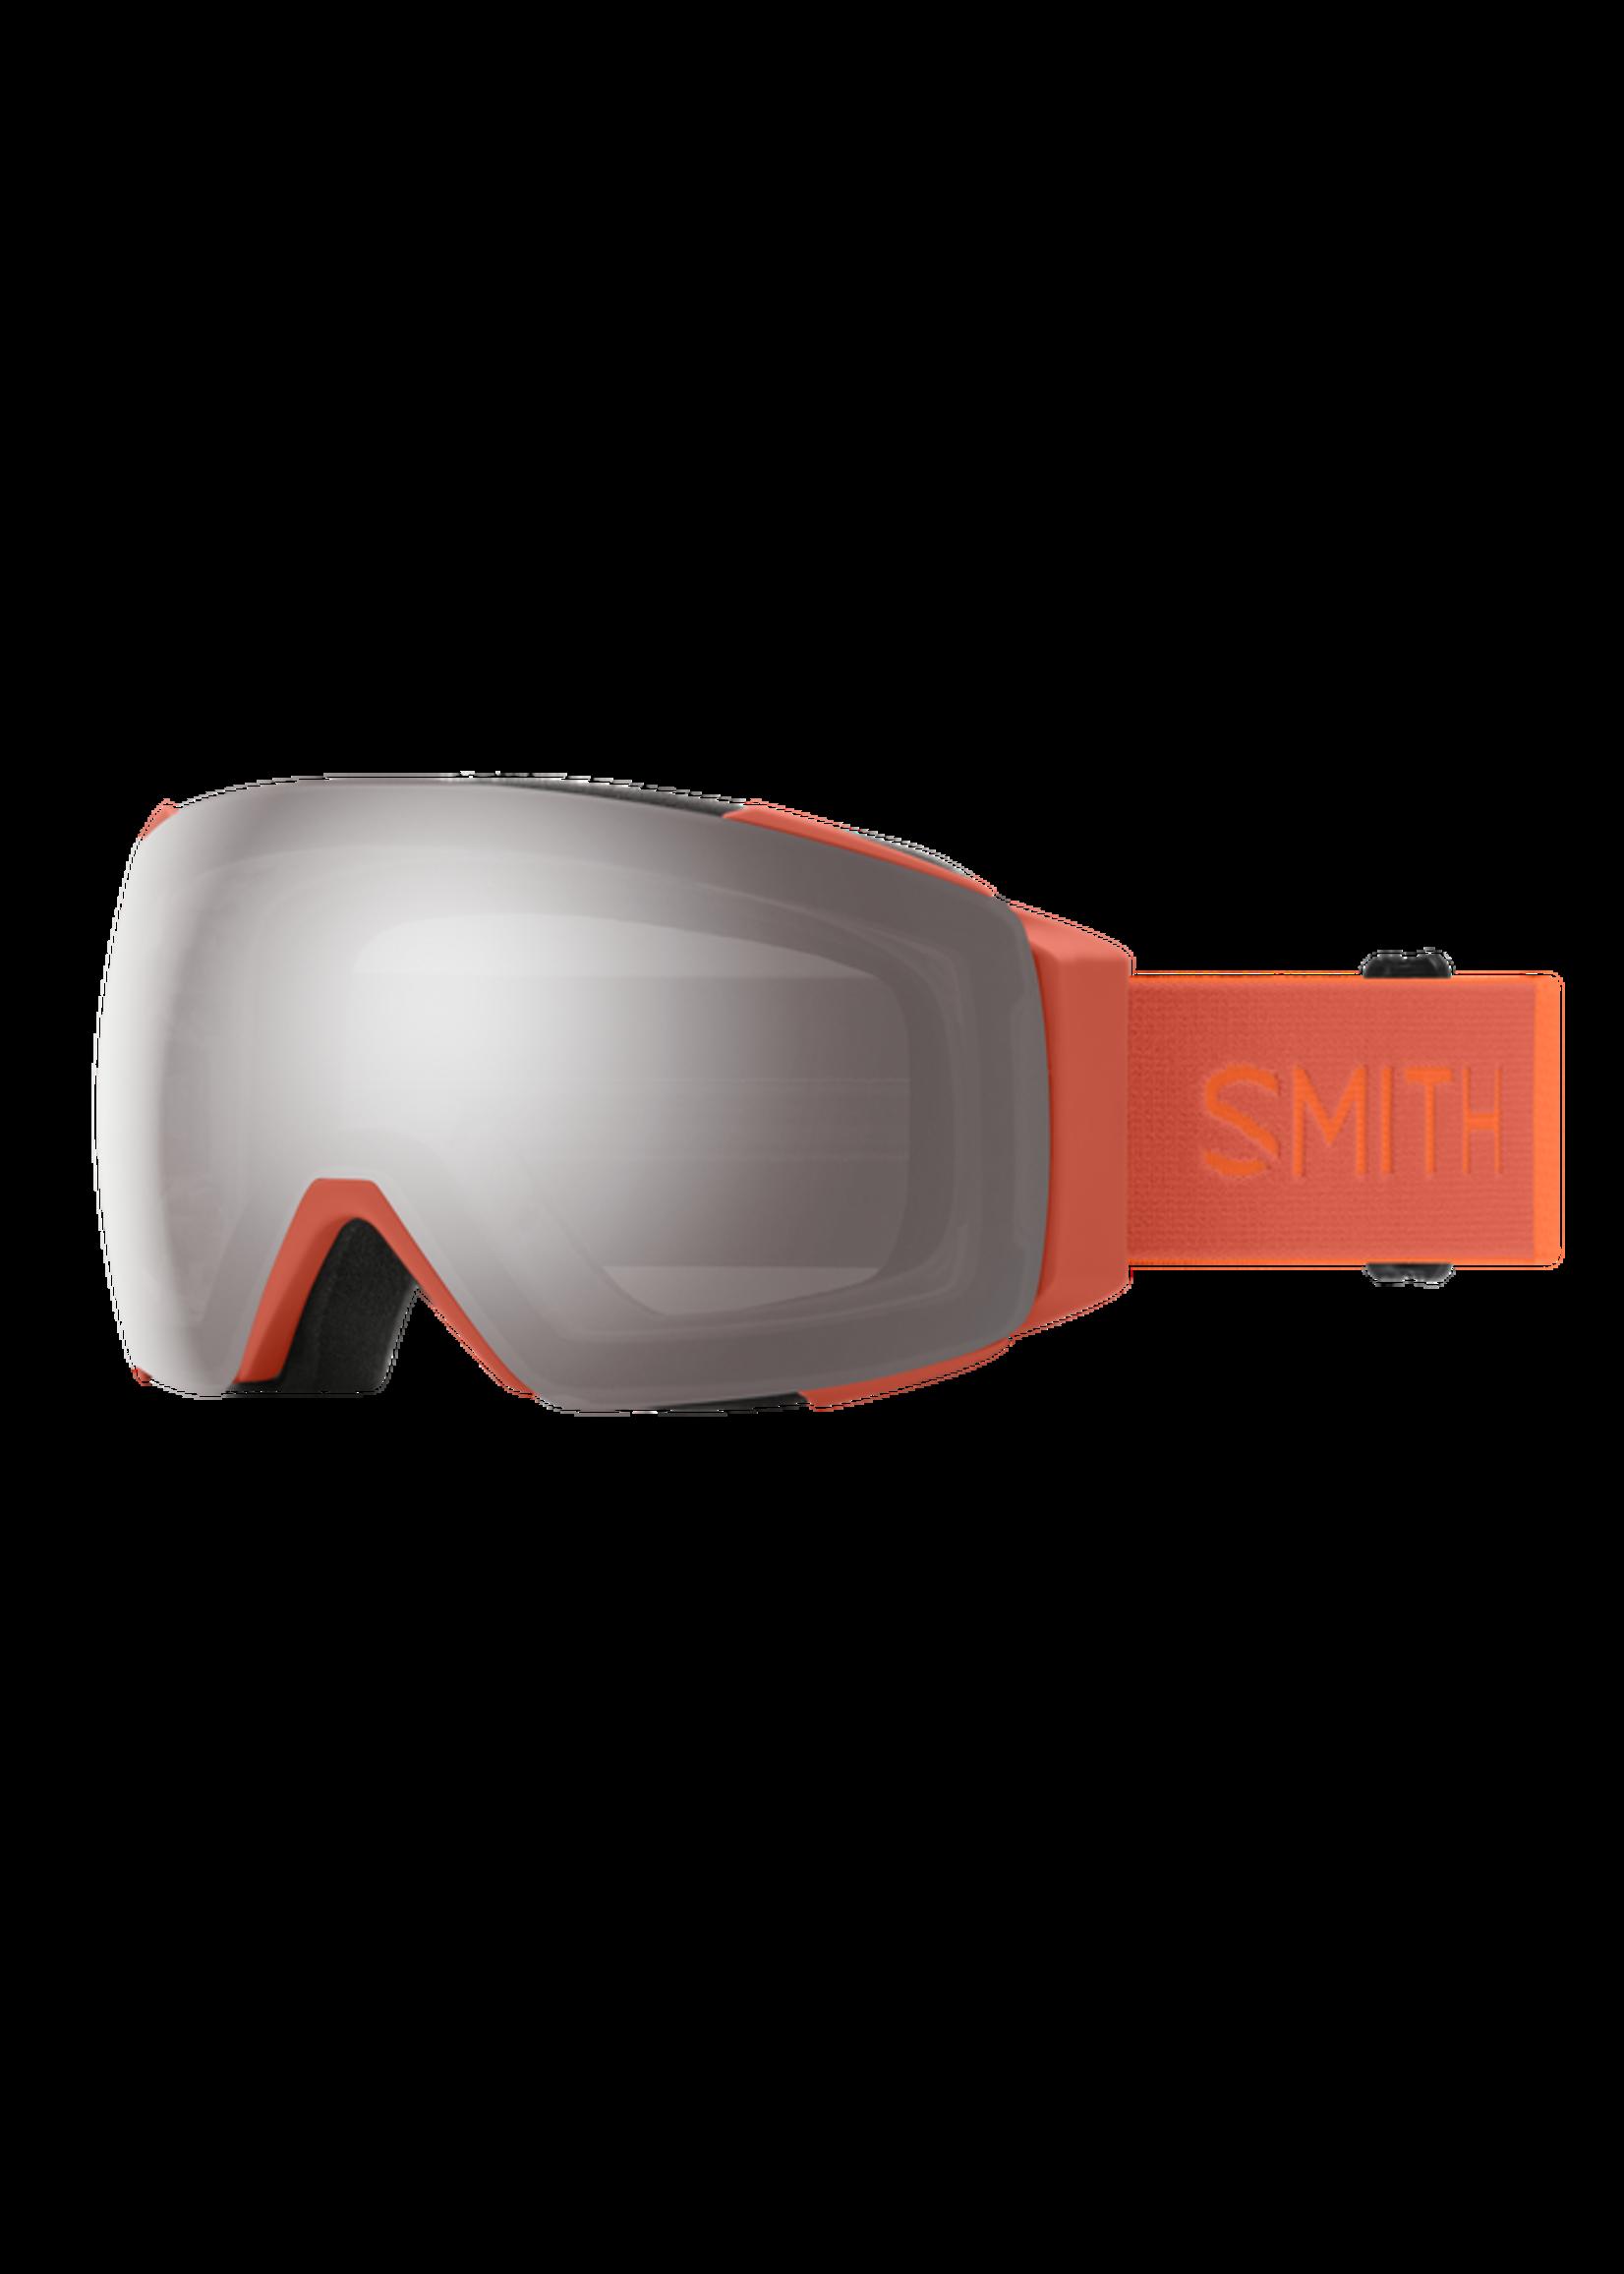 smith Smith I\O Mag Goggles